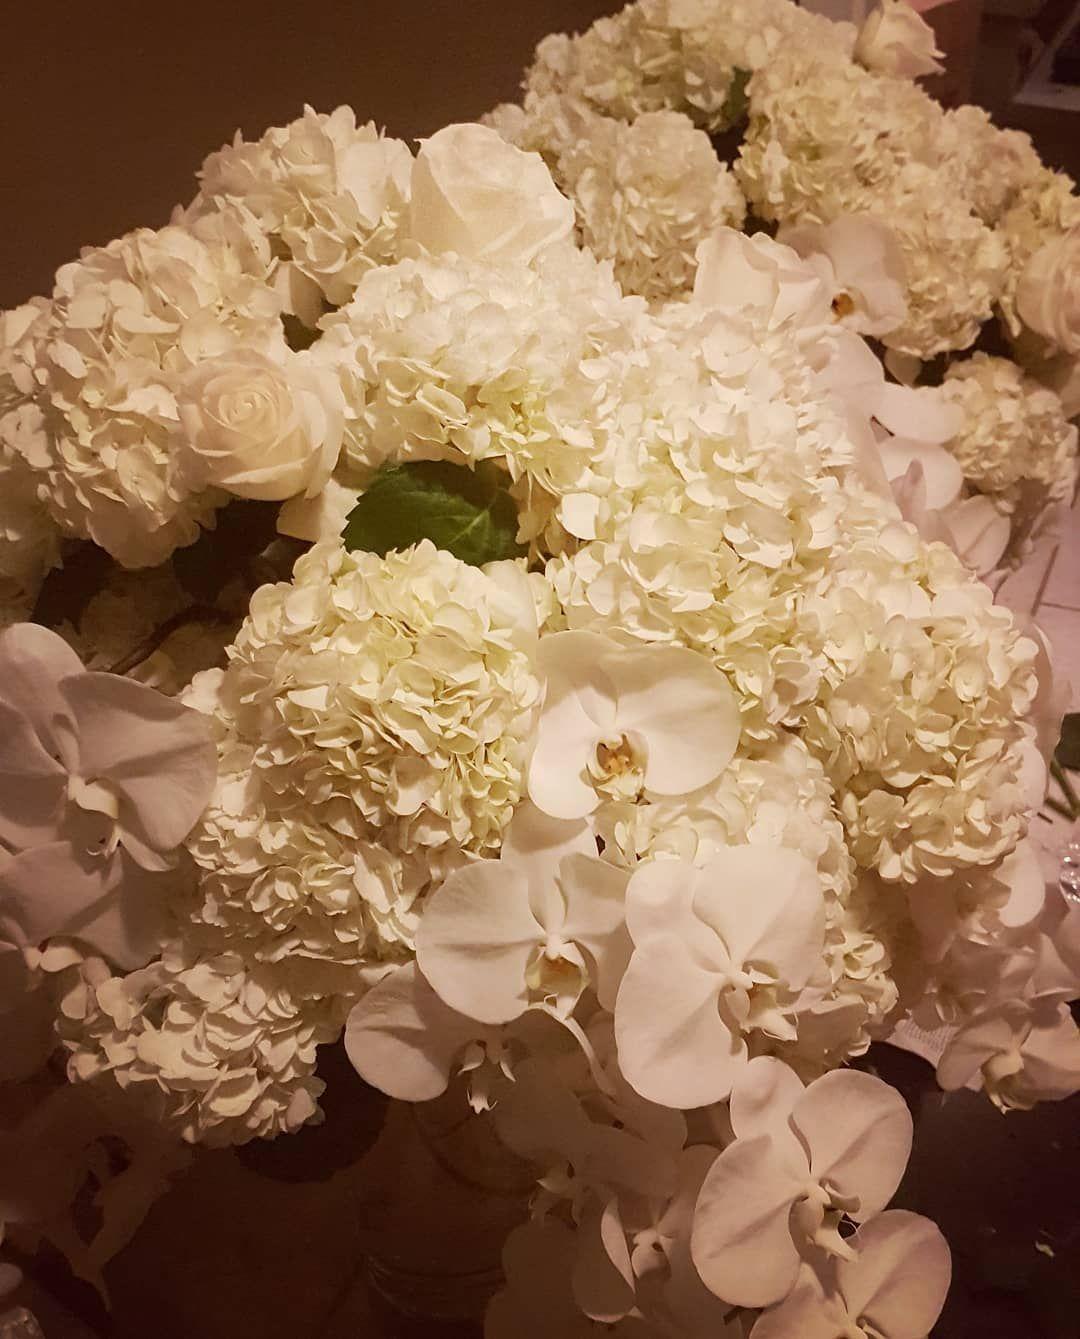 Clouds of luxurious blooms. heavenscentflowers